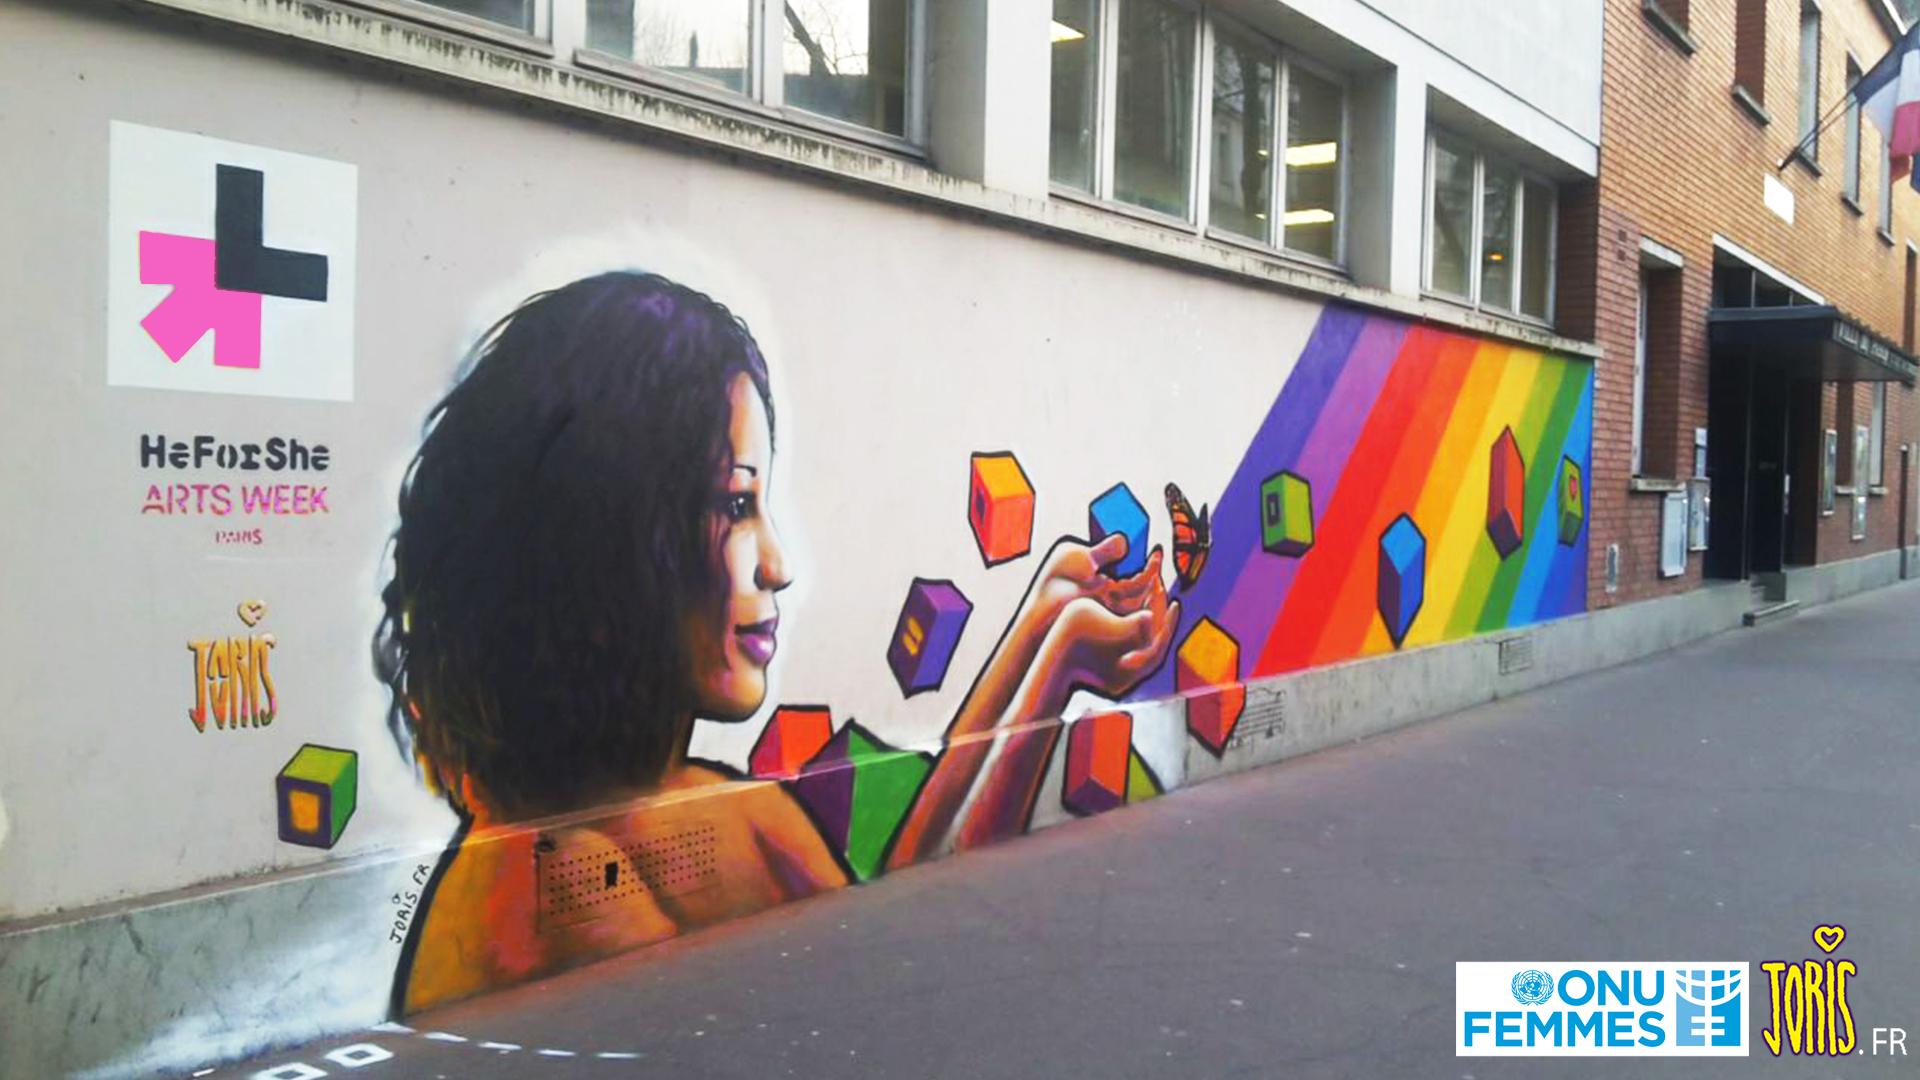 DECORATION-GRAFFITI-FRESQUE-TABLEAU-STREET-ART-PARIS-15